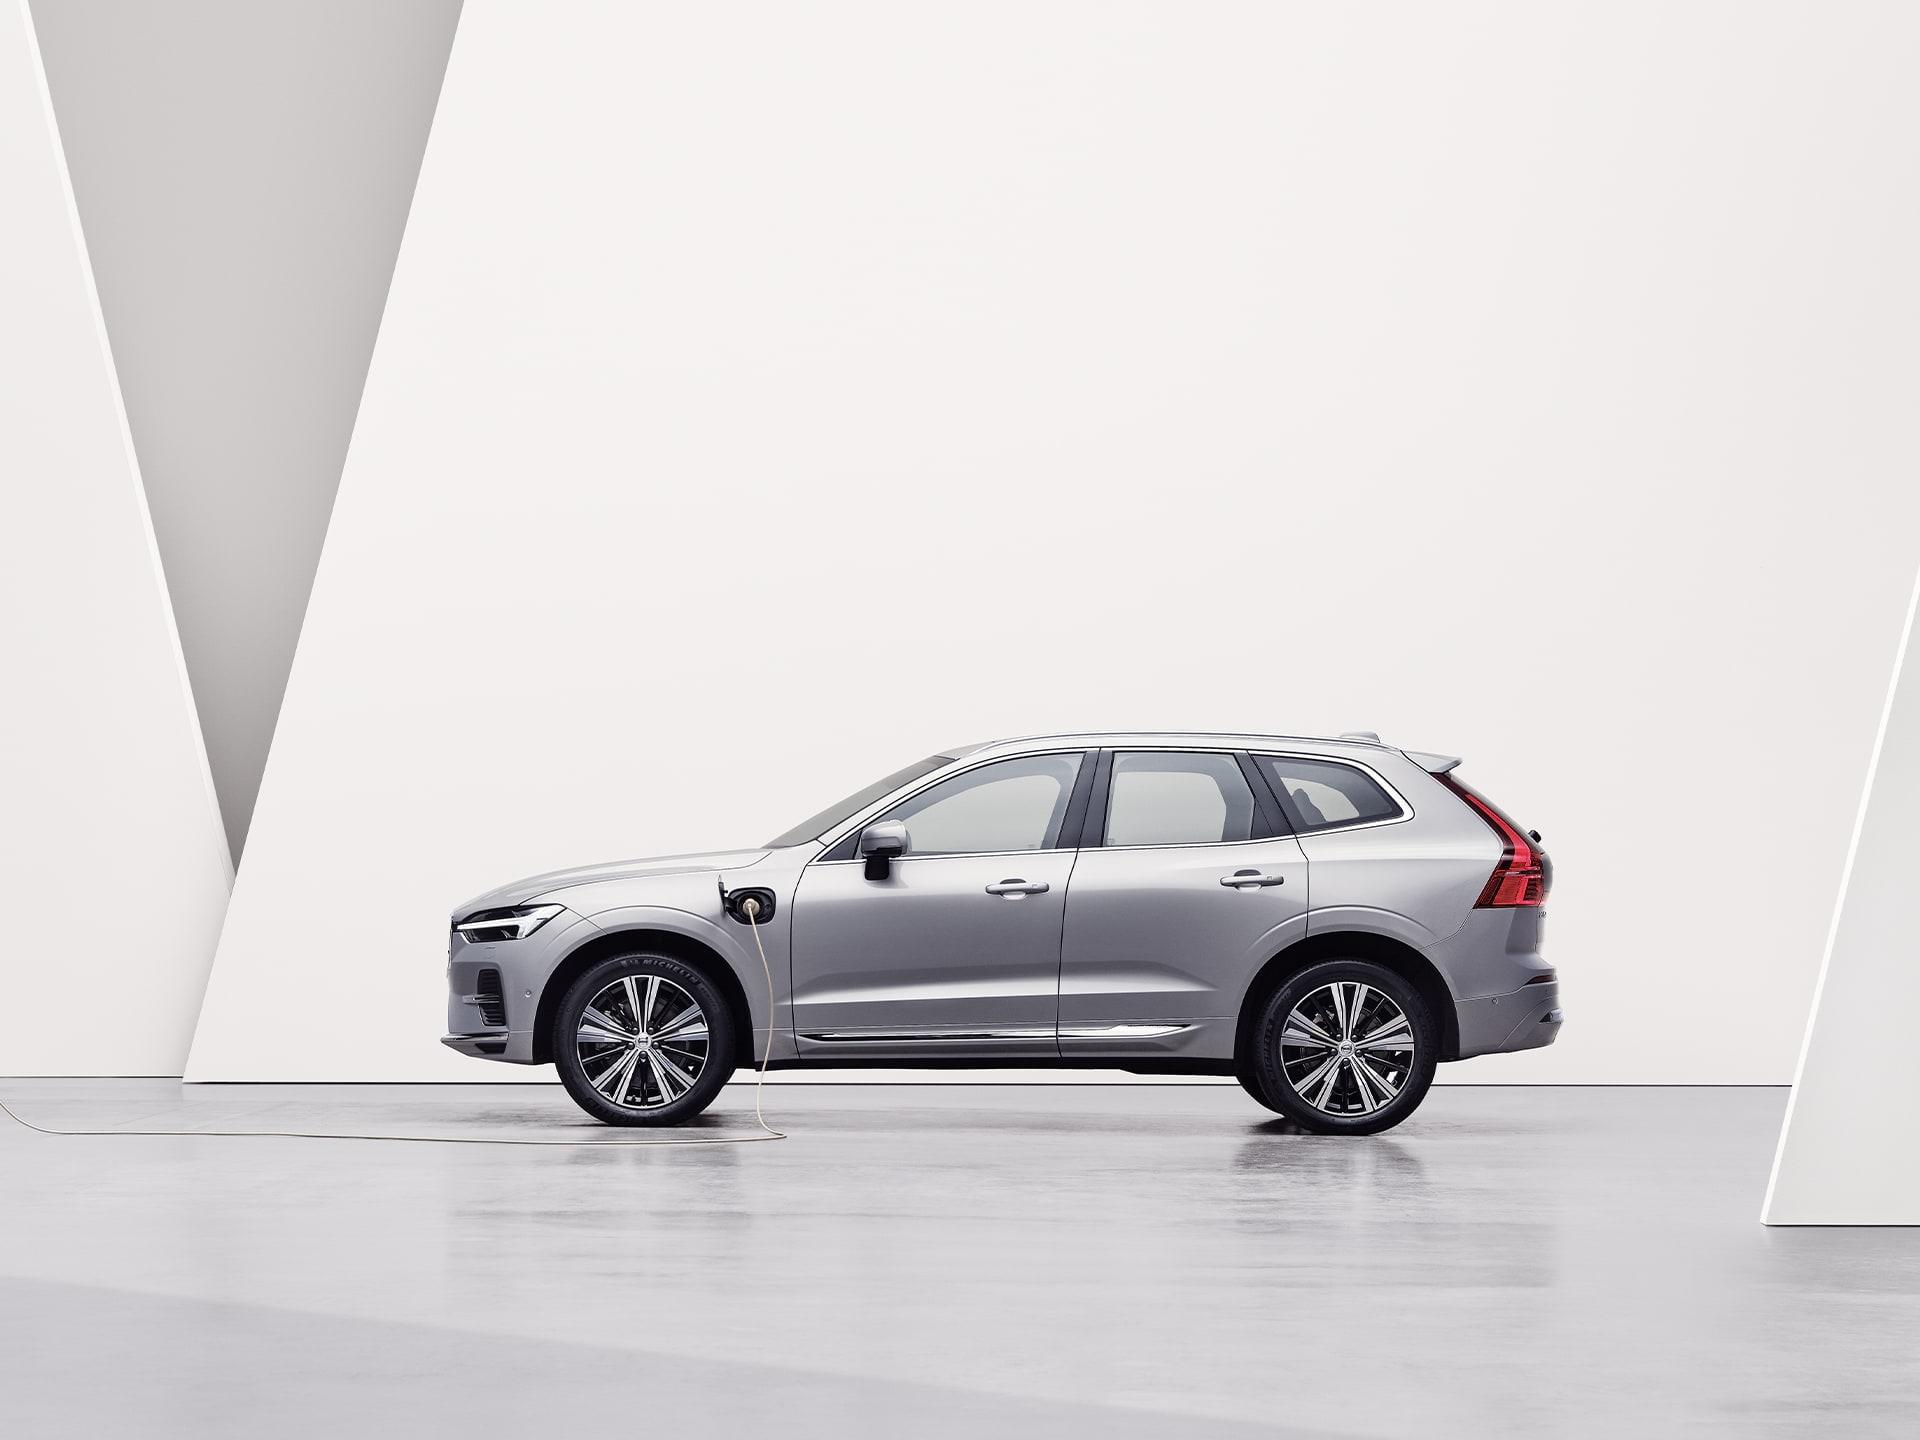 En silverfärgad Volvo XC60 Recharge laddar i en vit omgivning.